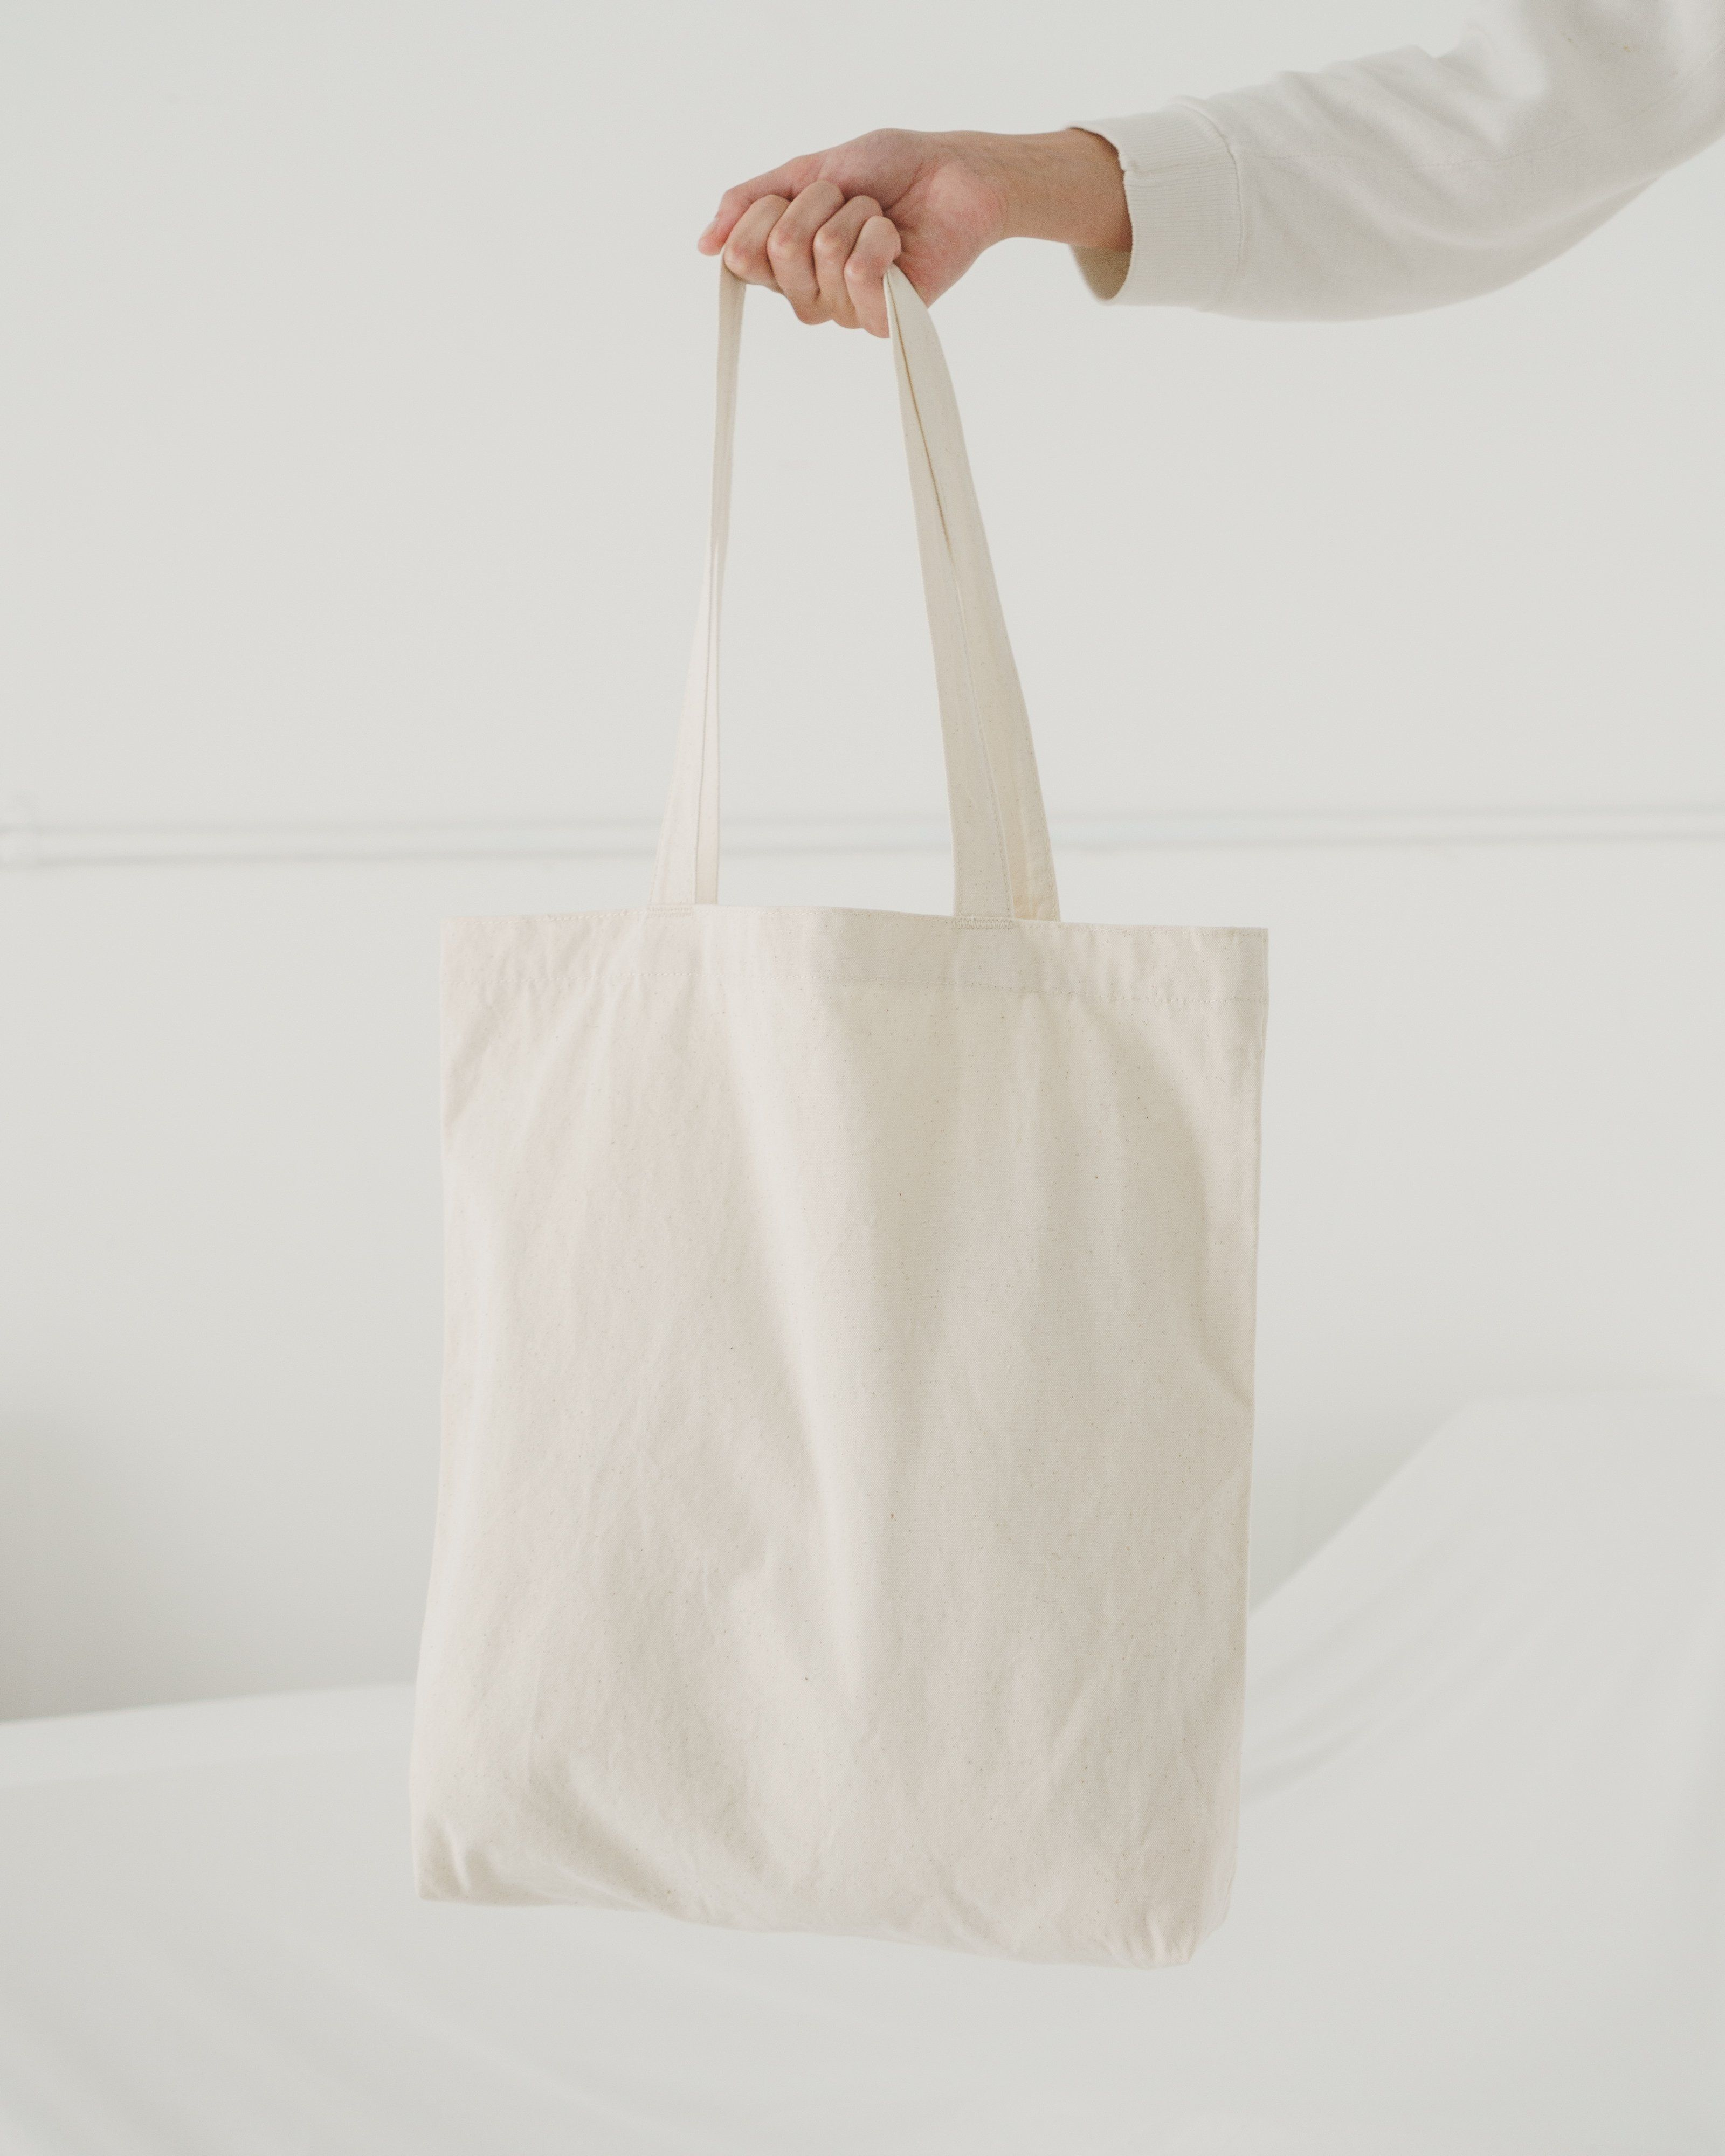 Merch Tote Natural Canvas In 2021 Plain Canvas Tote Bag Canvas Tote Bag Outfit Plain Tote Bags